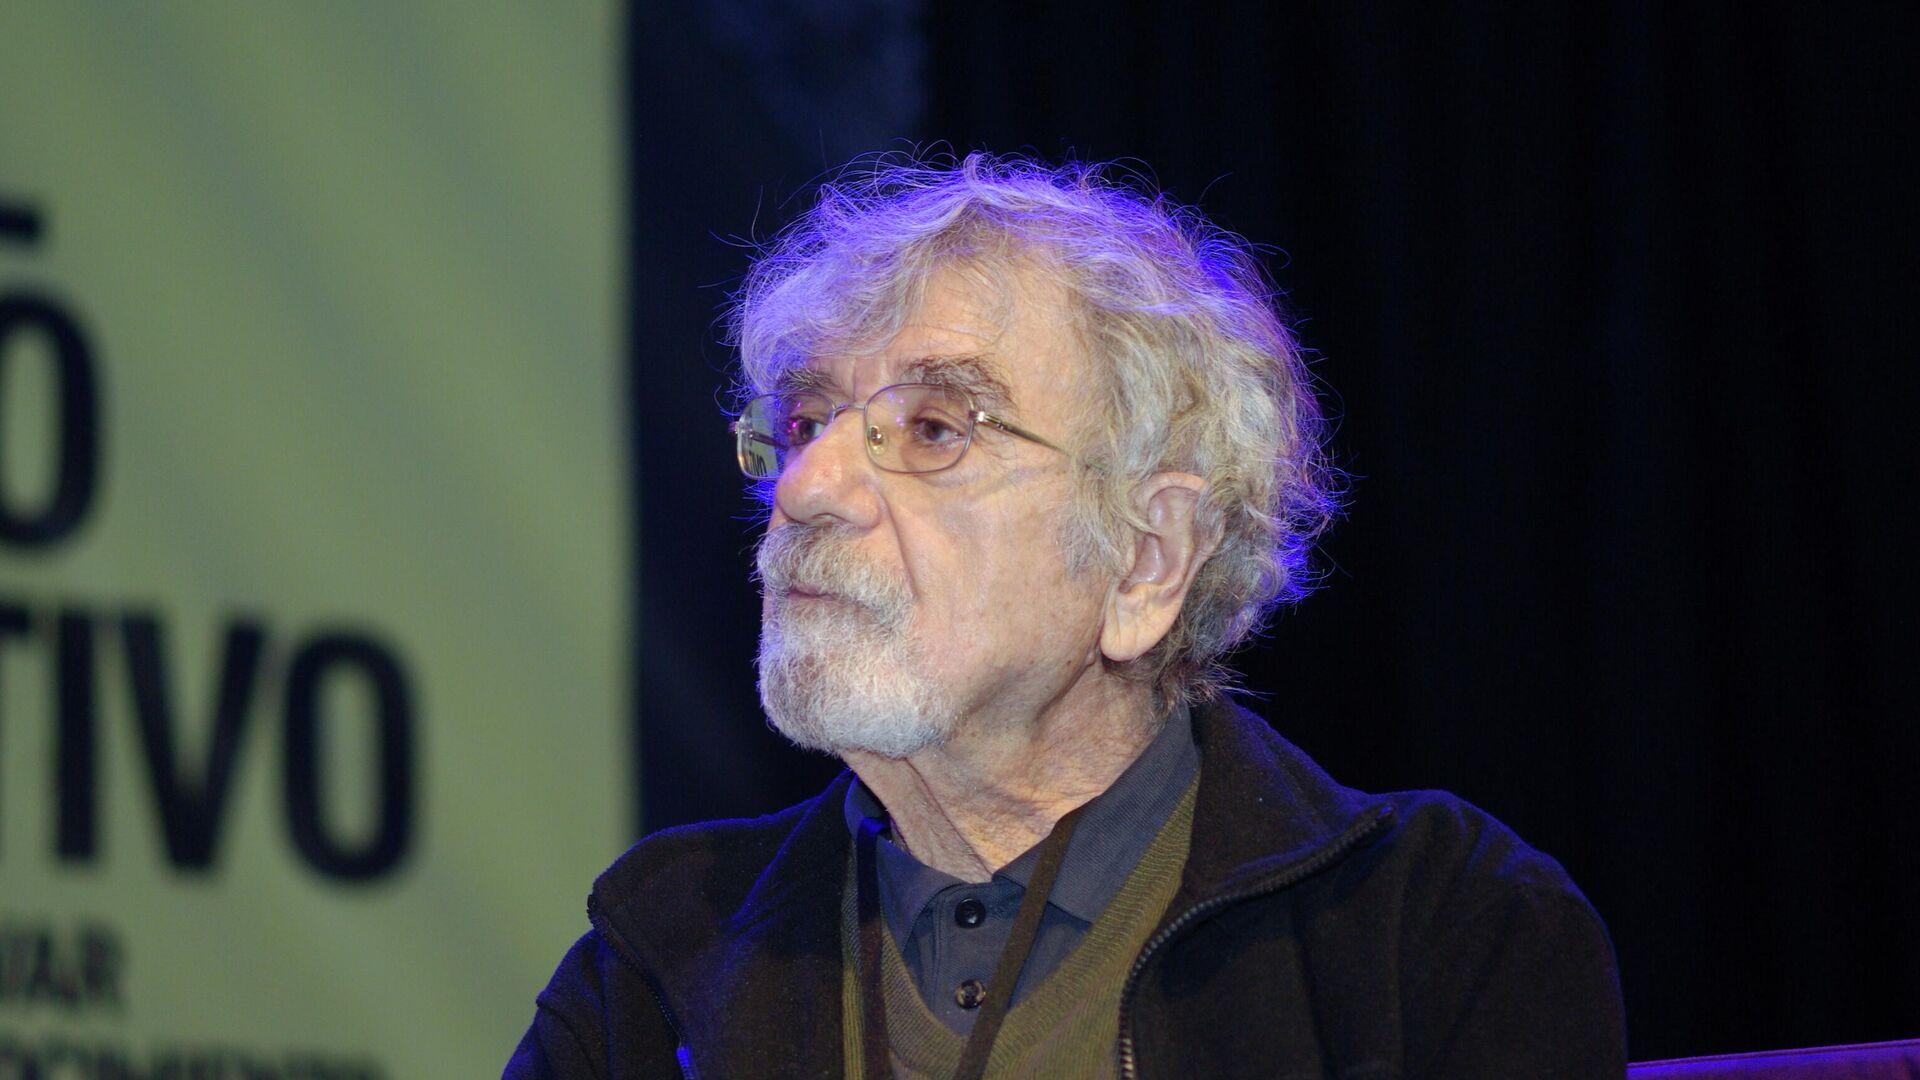 Humberto Maturana, reconocido biólogo y escritor chileno  - Sputnik Mundo, 1920, 06.05.2021